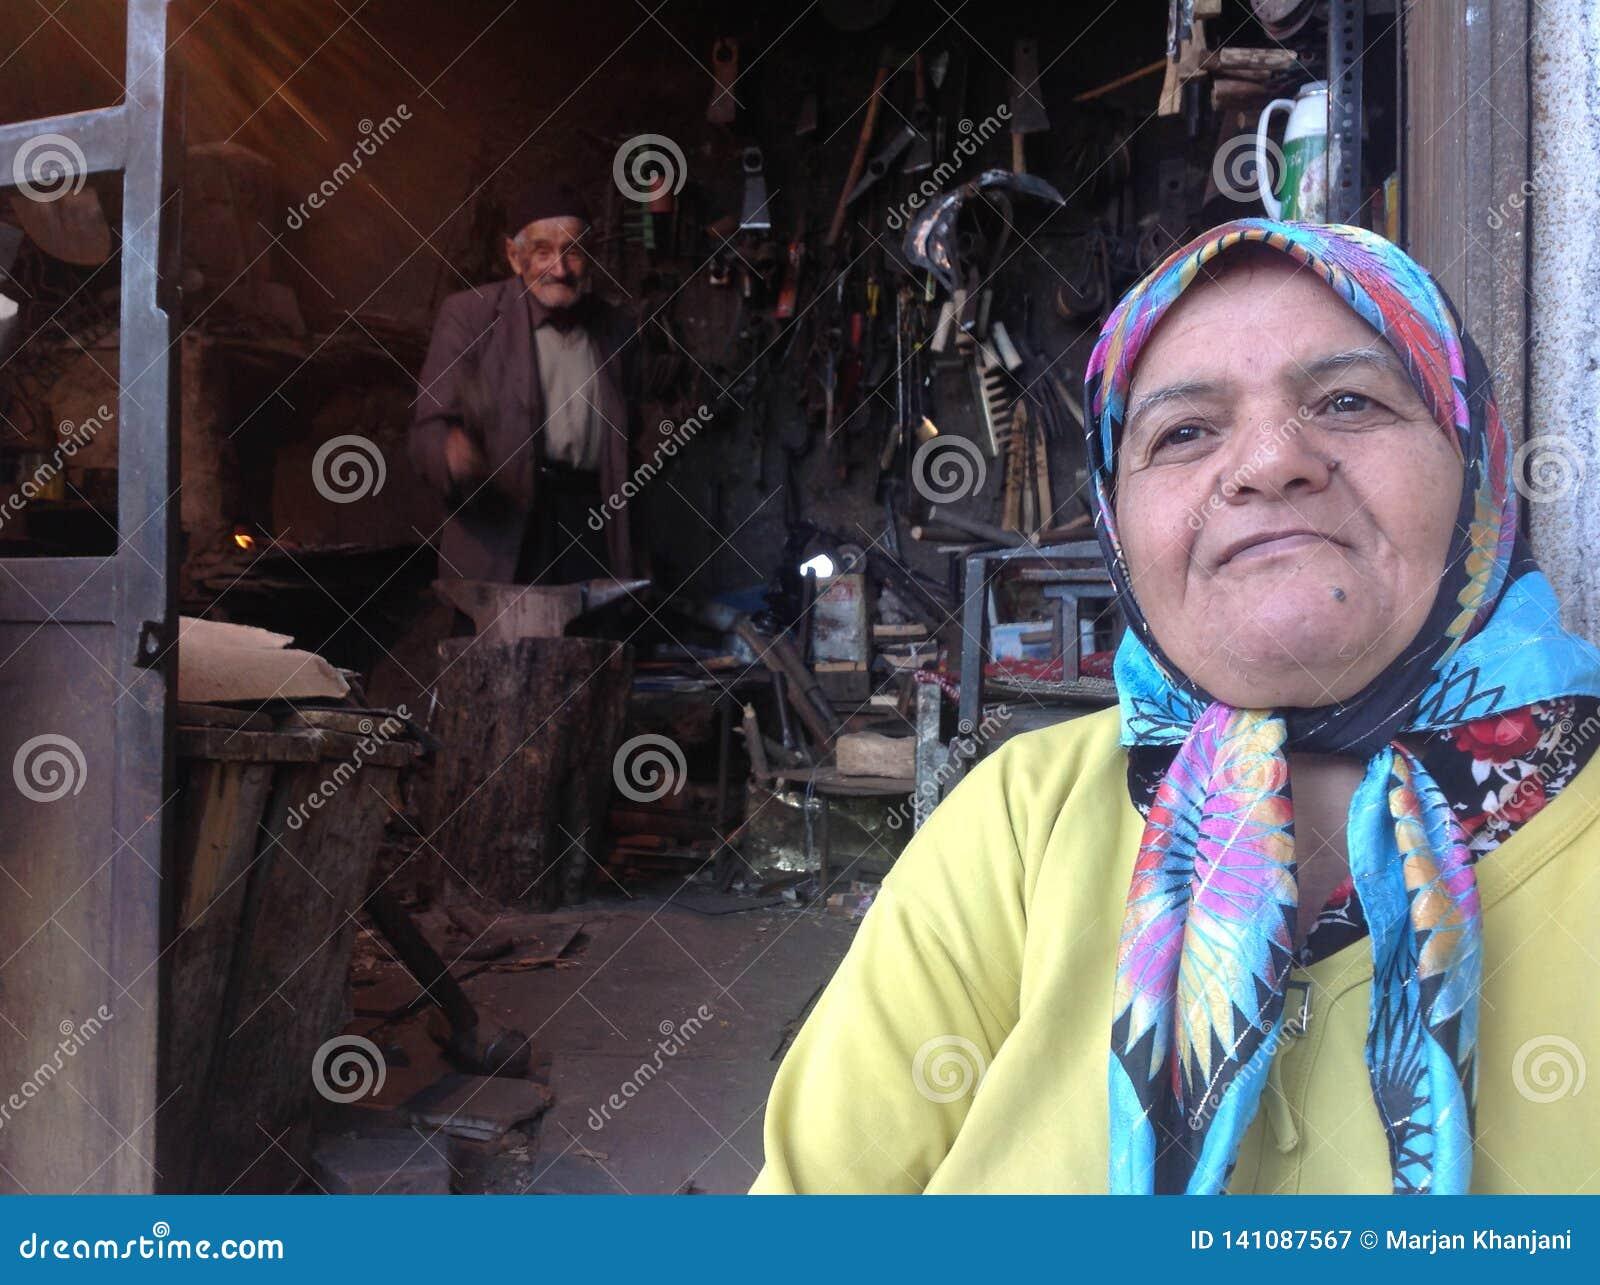 Old artisan couple working in their blacksmith shop in Roudbar, Iran